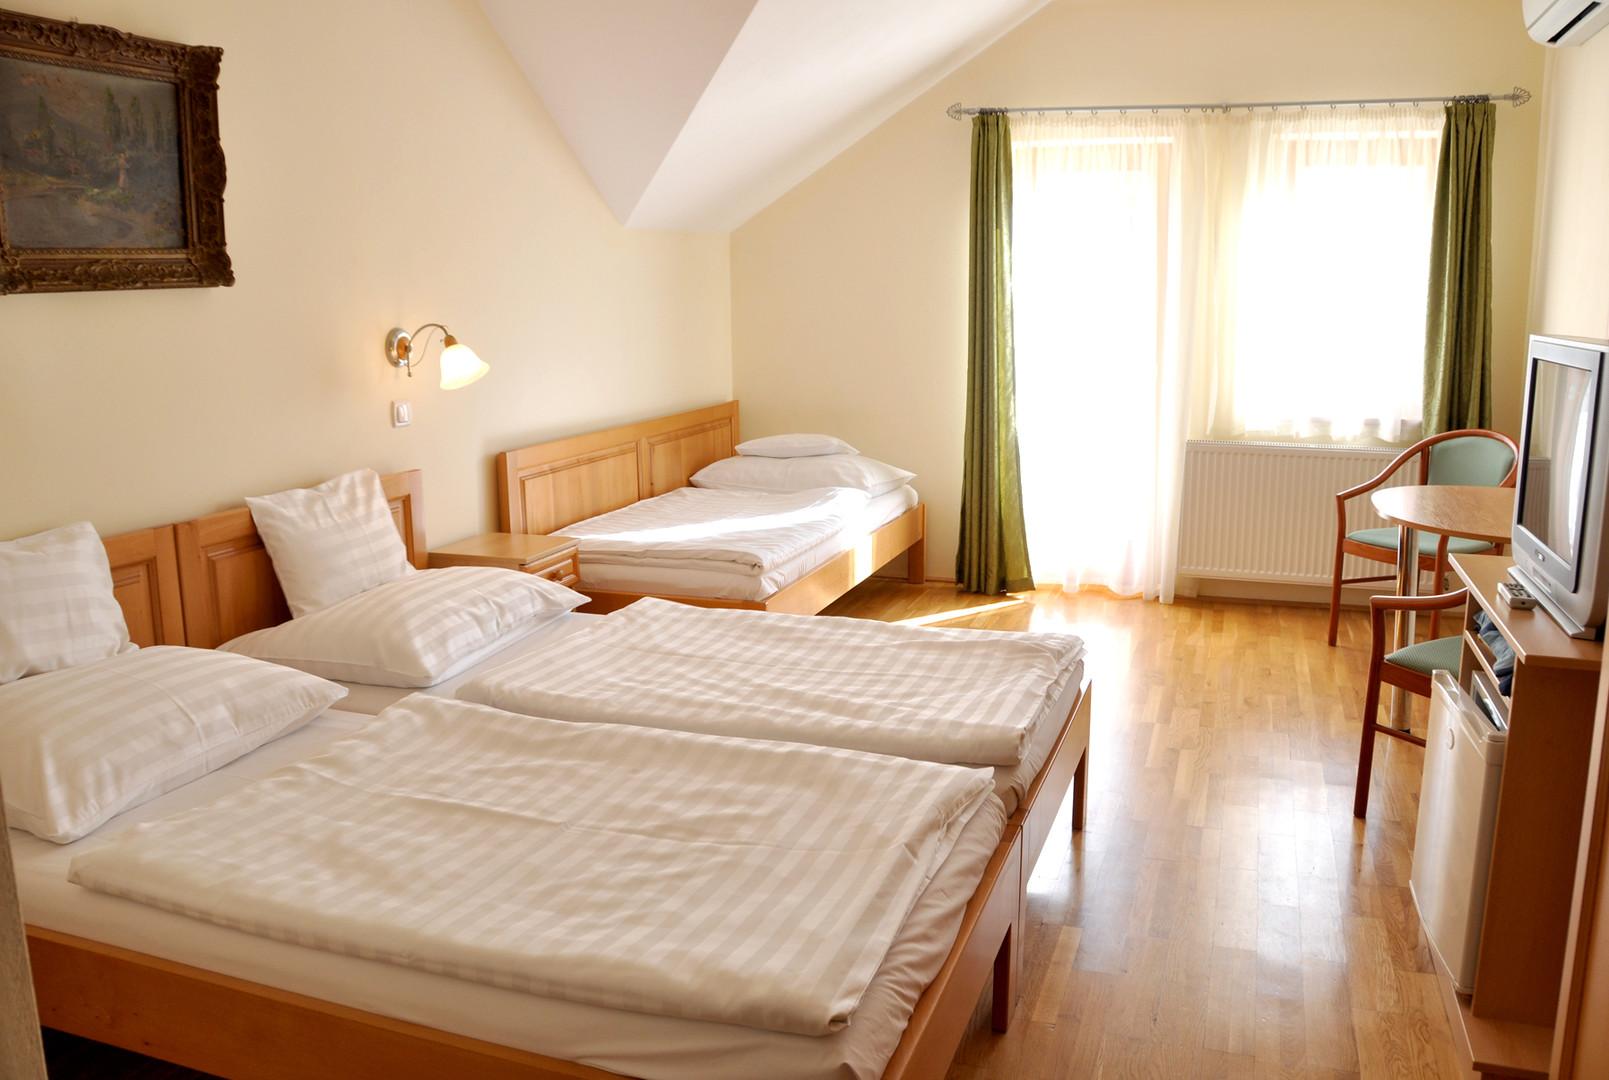 Hotel Ametiszt #3